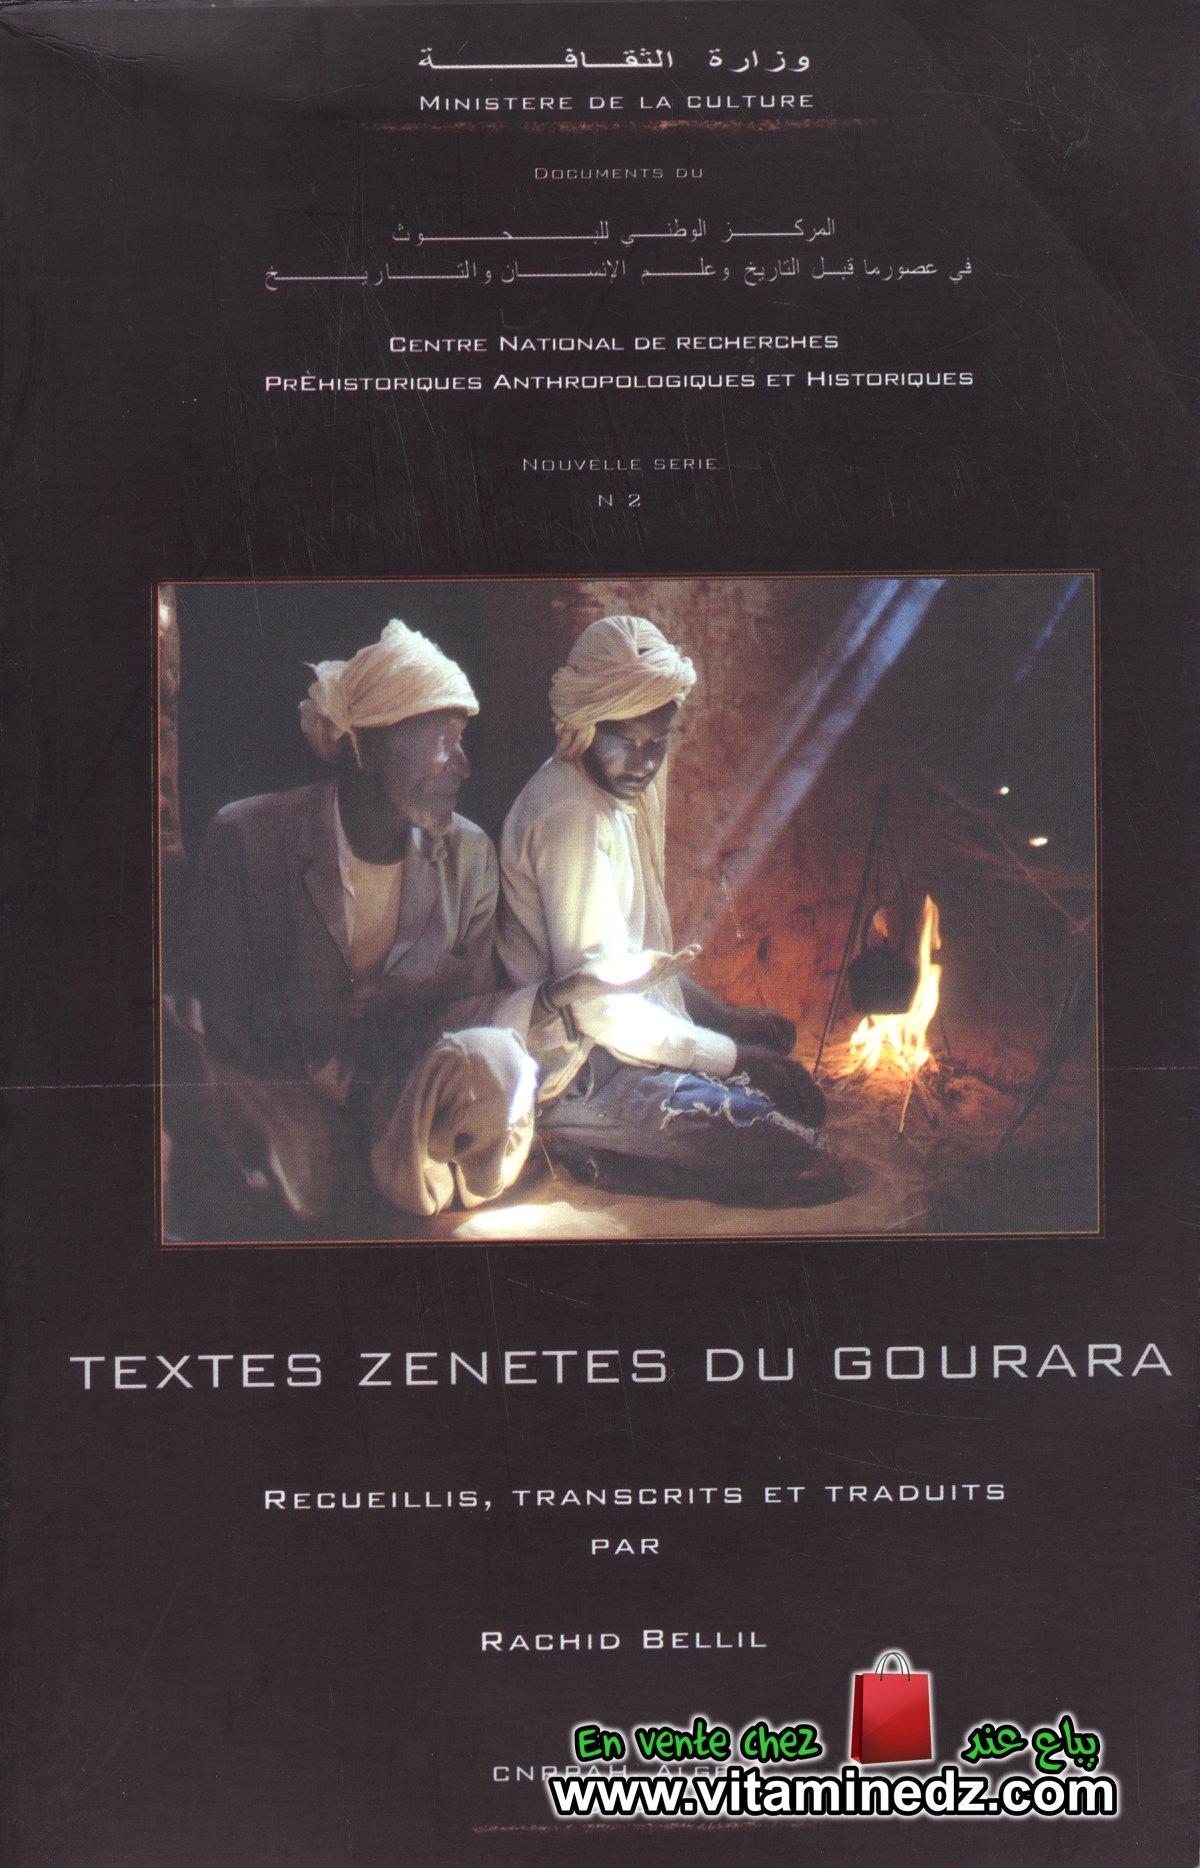 Rachid Bellil - Textes Zenetes du Gourara